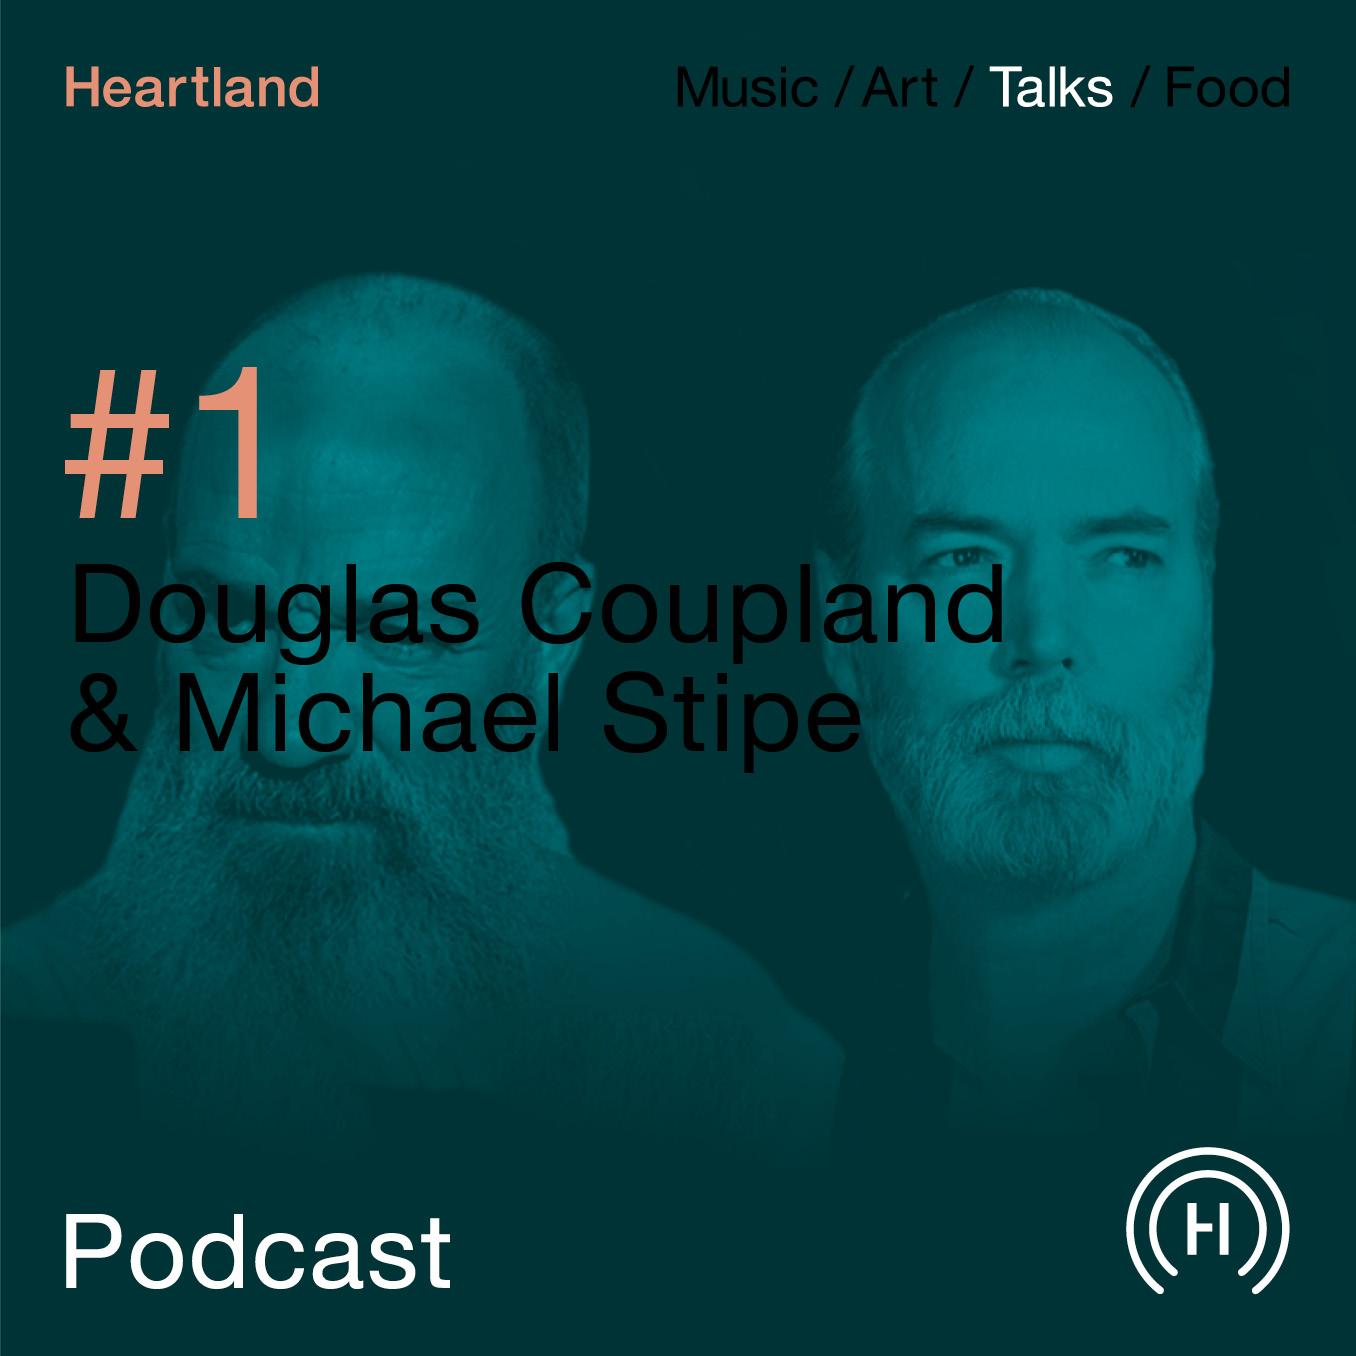 Heartland_New2018_Podcast#1.jpg